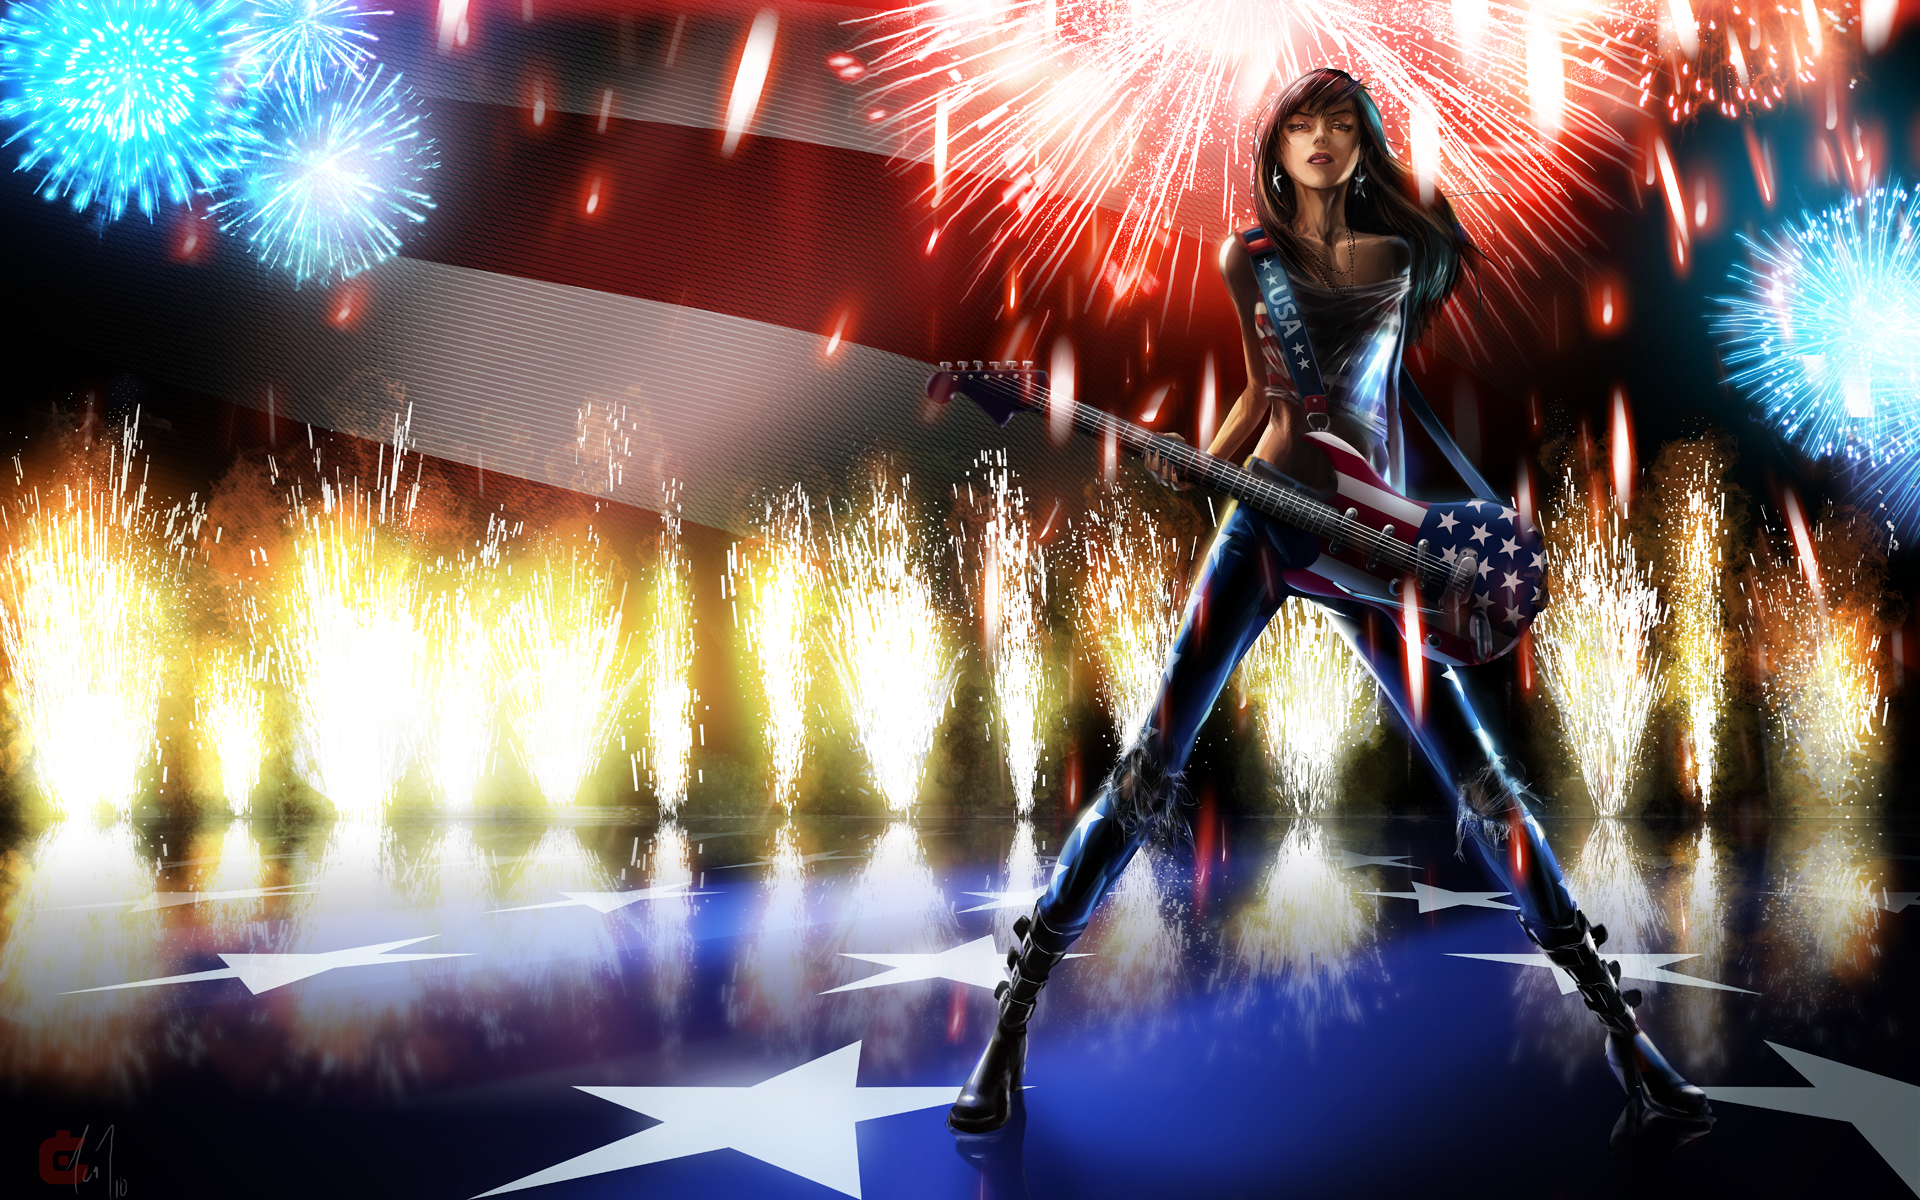 American Woman by Jonzy